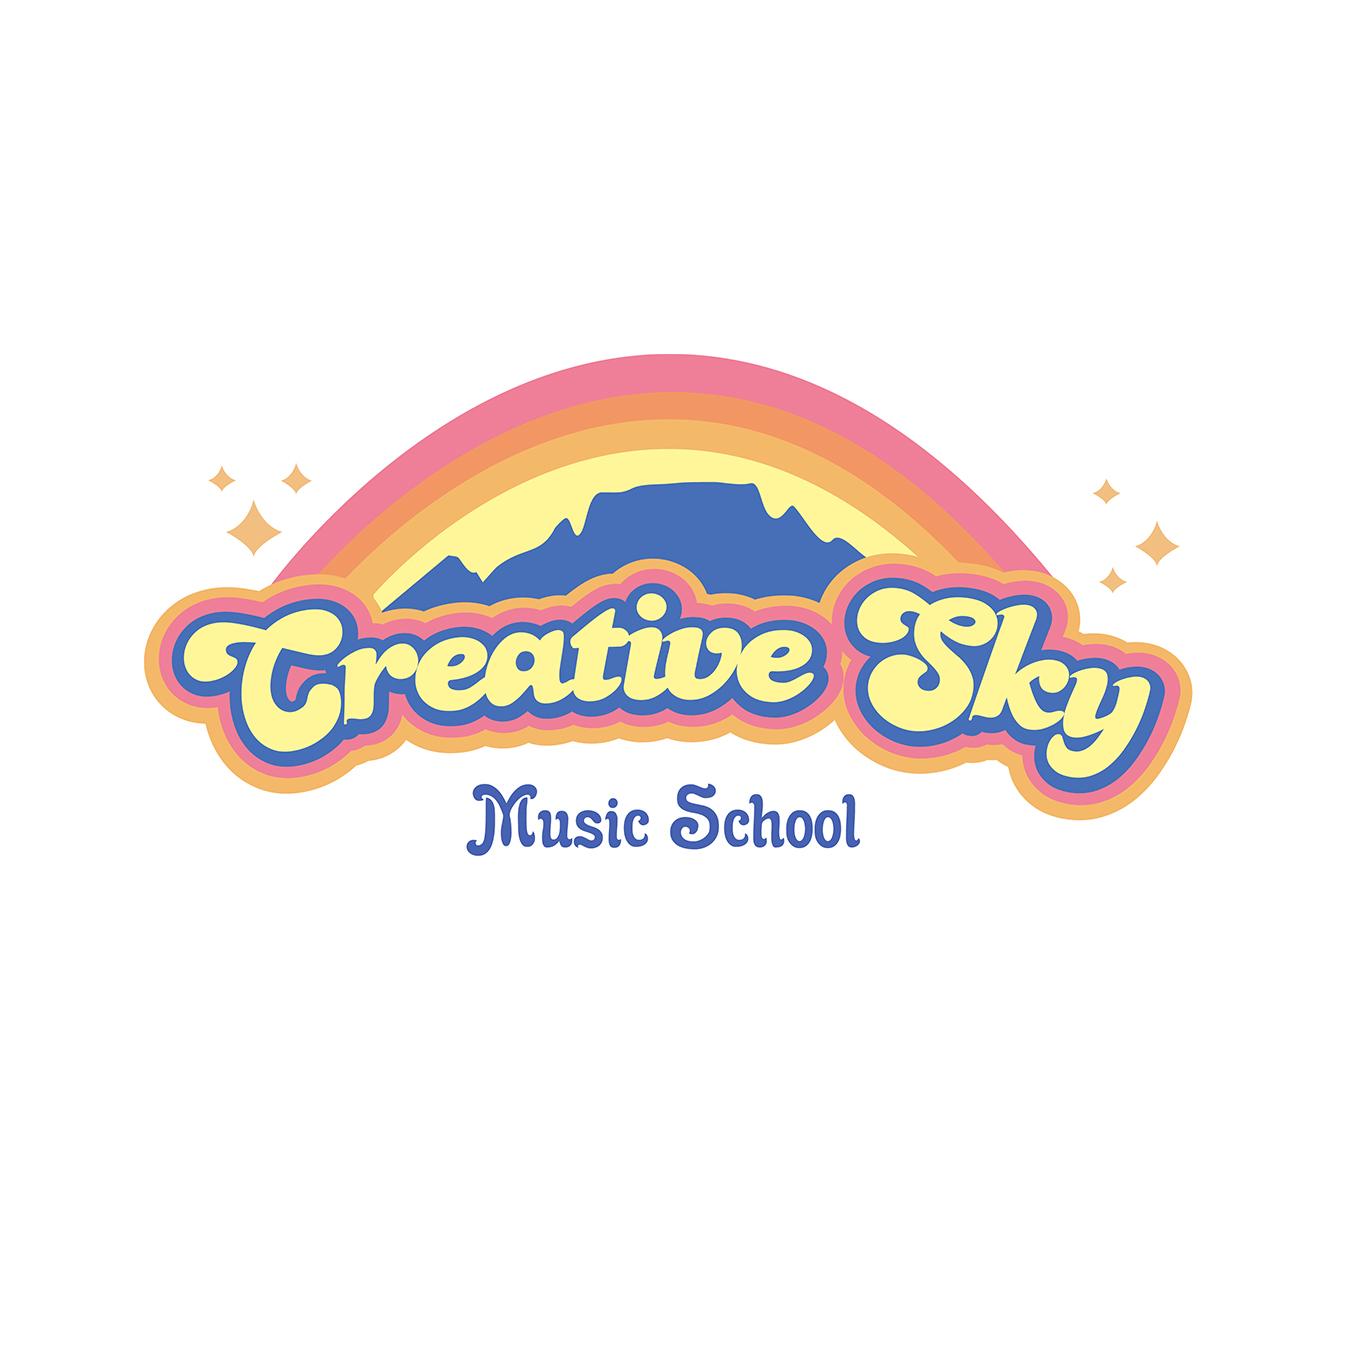 CreativeSky_WhiteBG